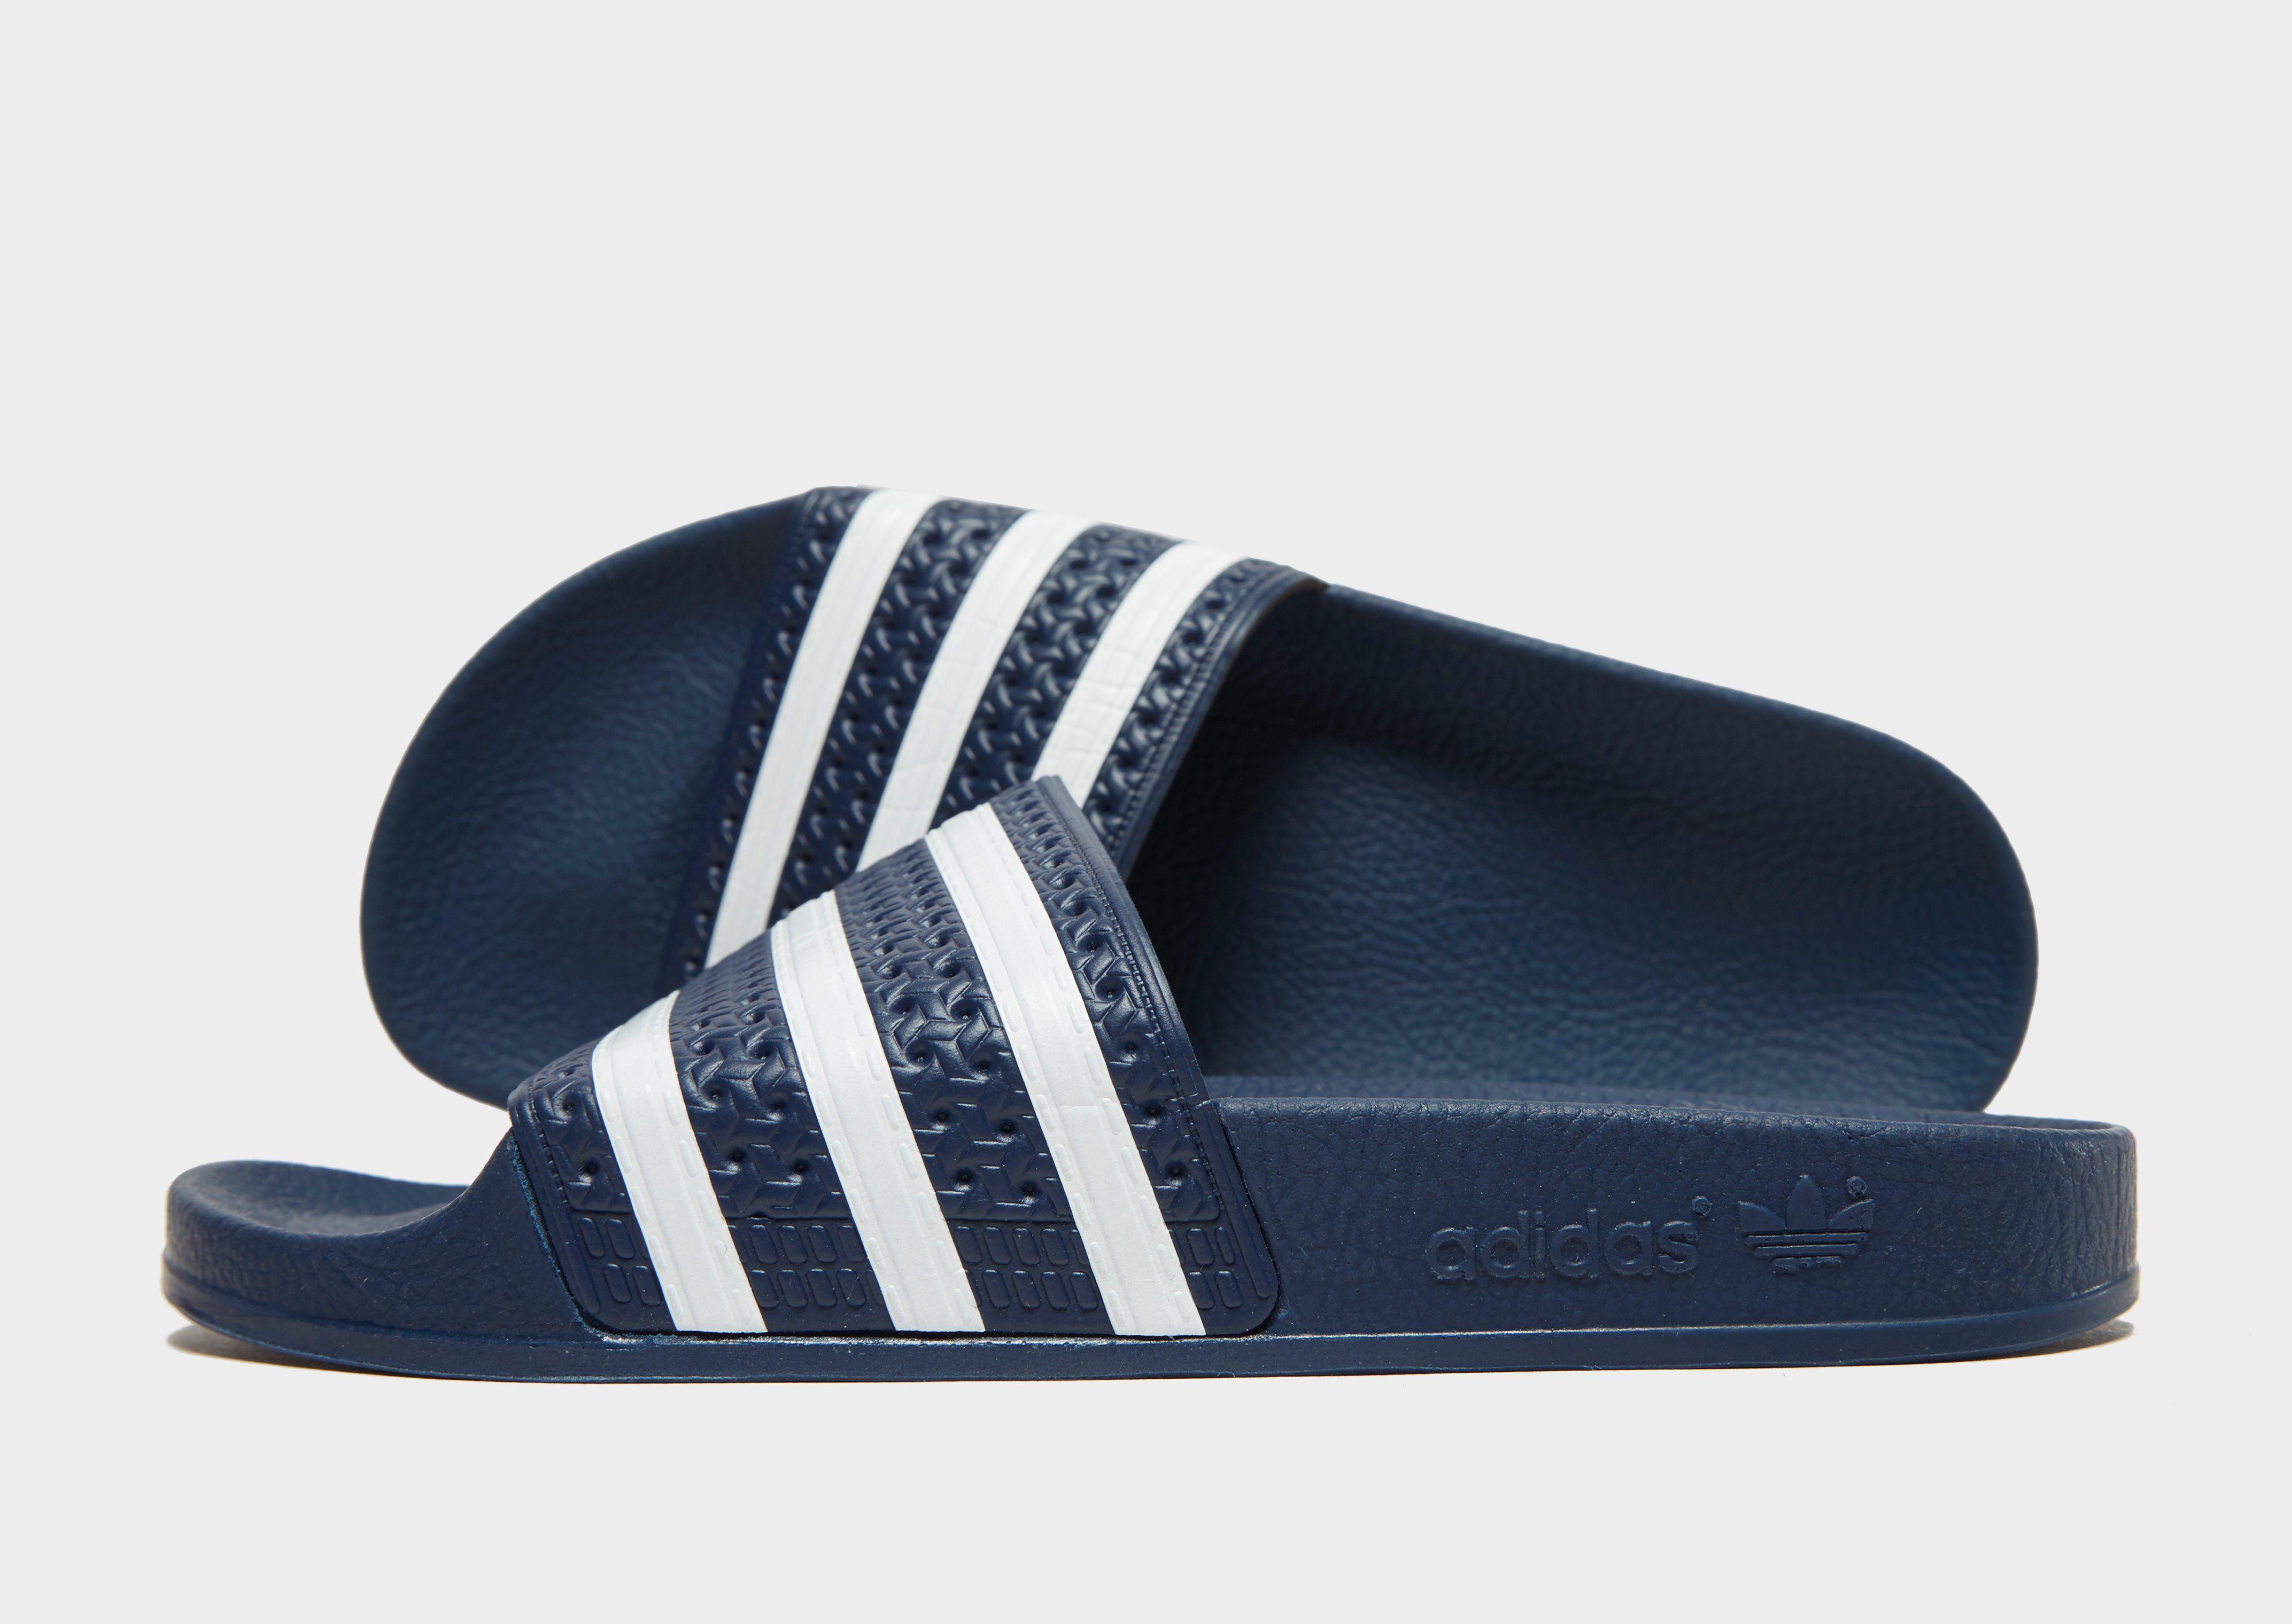 0c62cce2307 Women - Adidas Originals Flip-Flops   Sandals